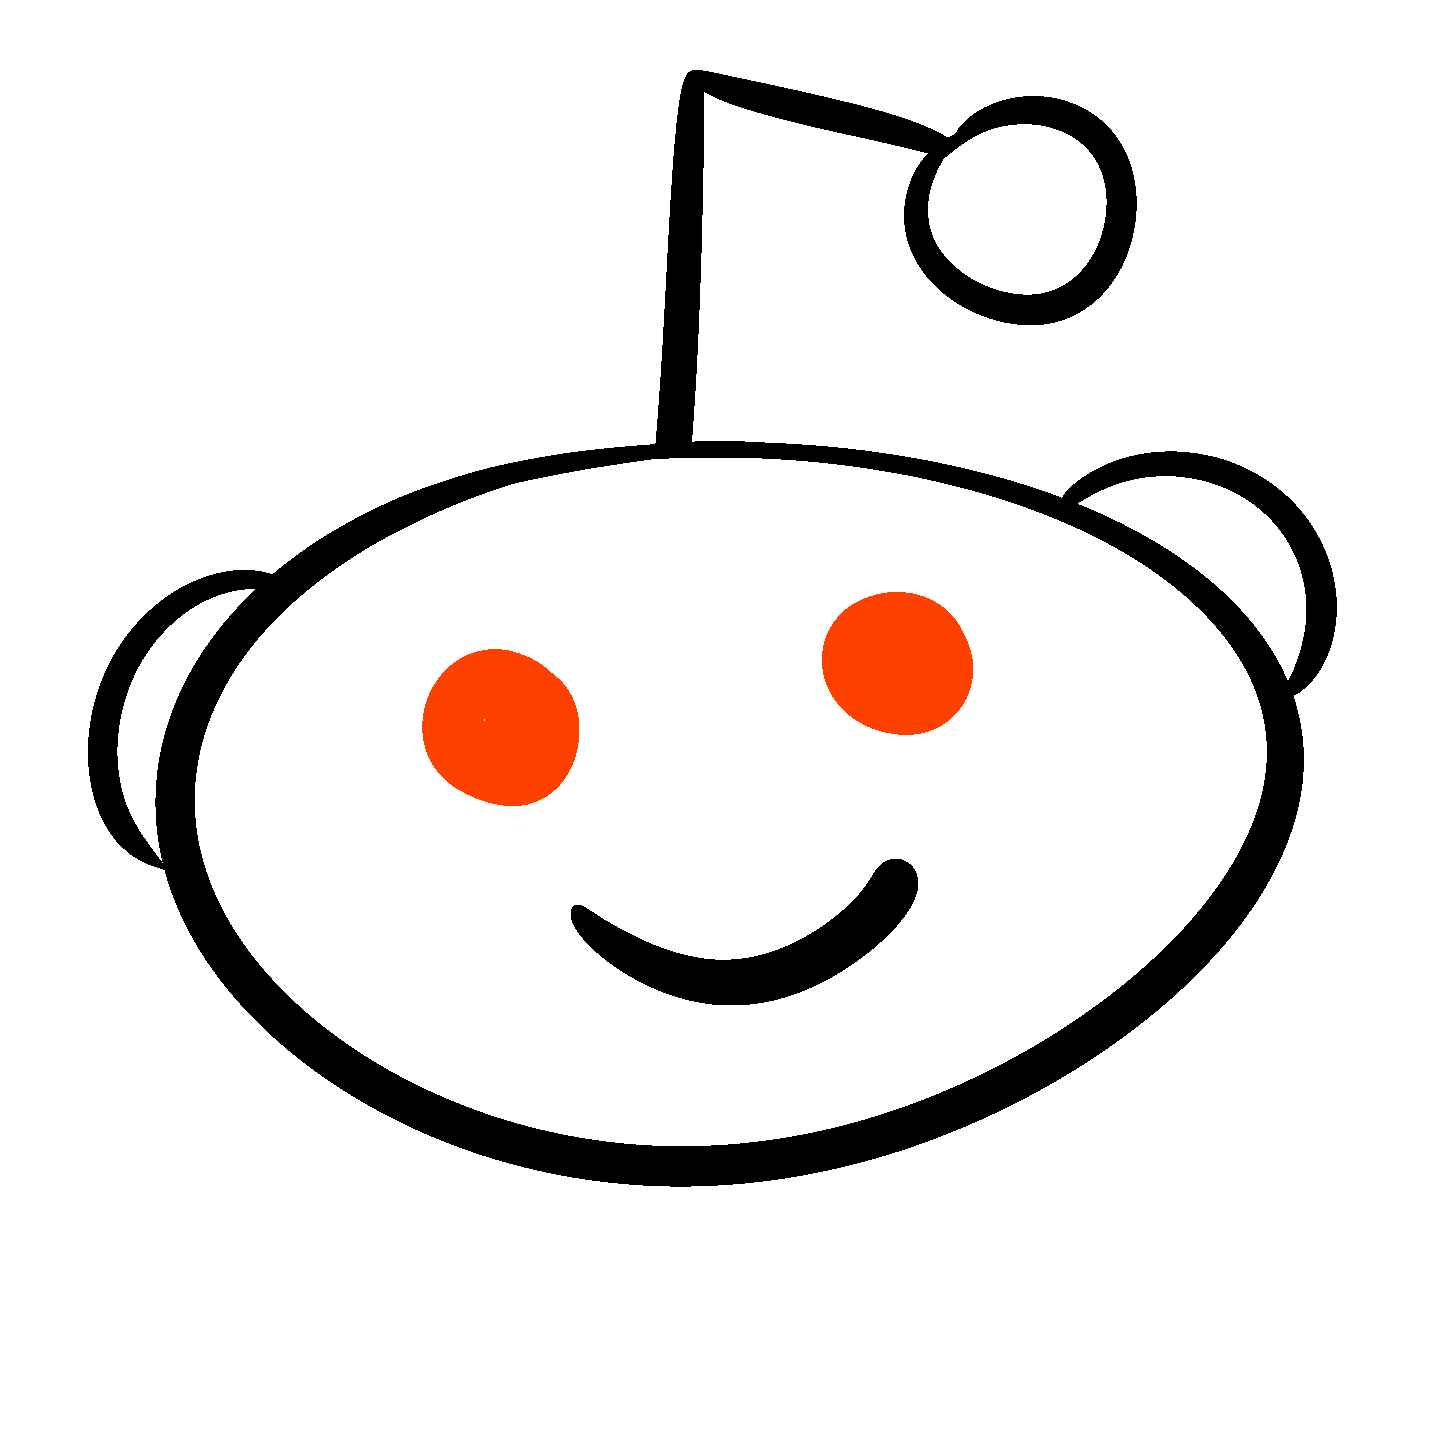 RedditThis_Btn.png